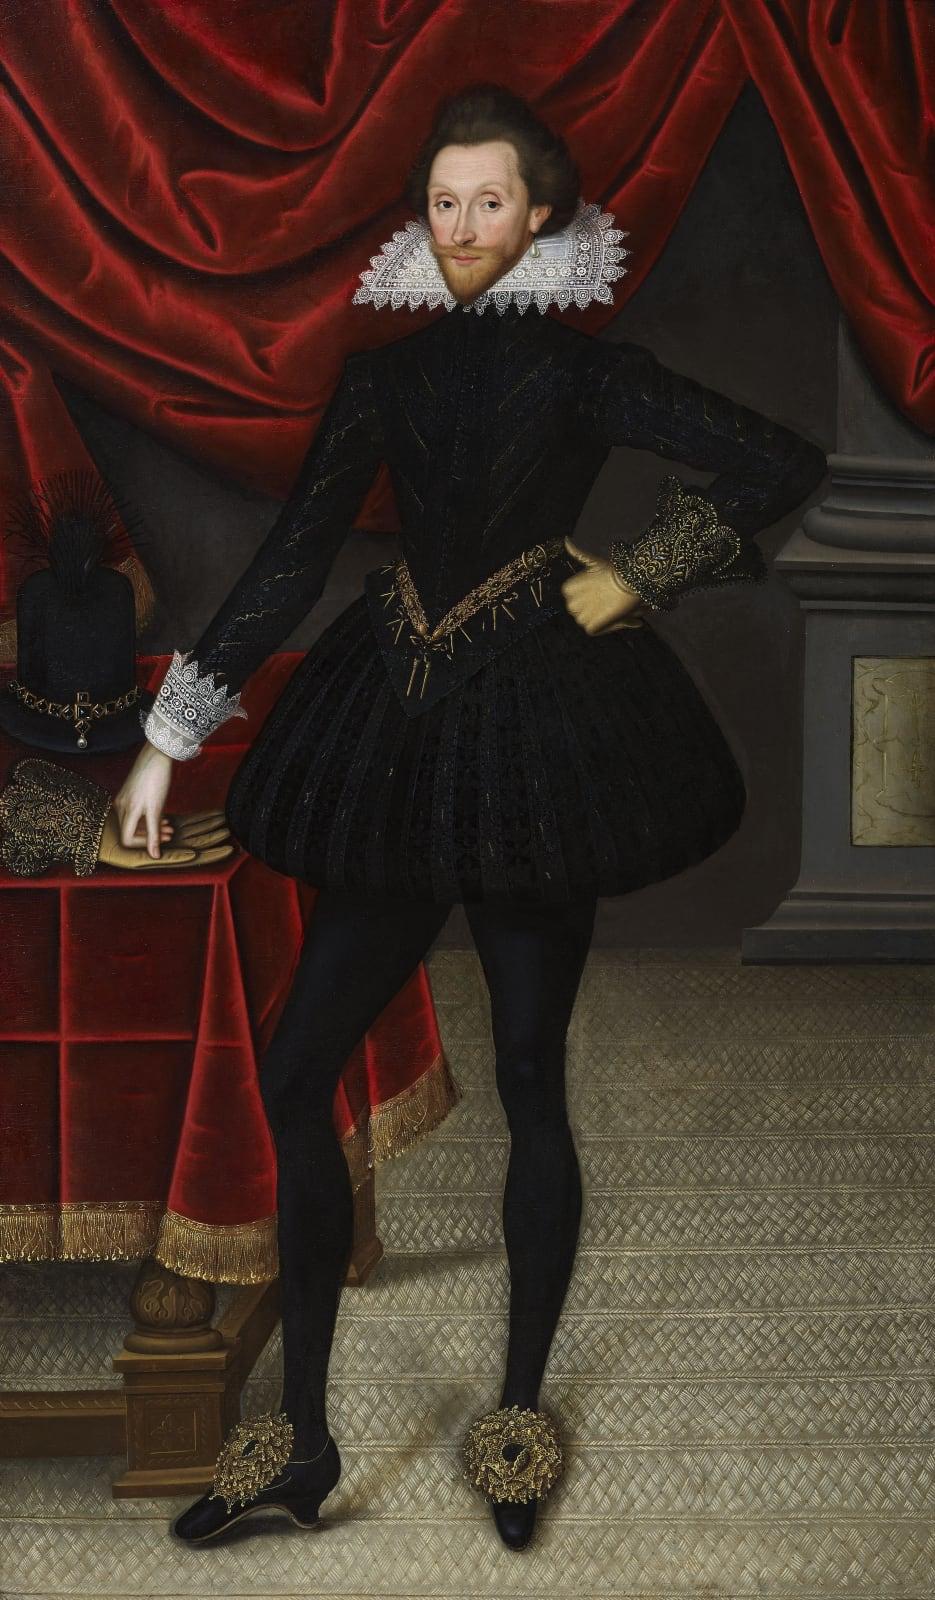 James Hay, 1st Earl of Carlisle (1580 – 1636)